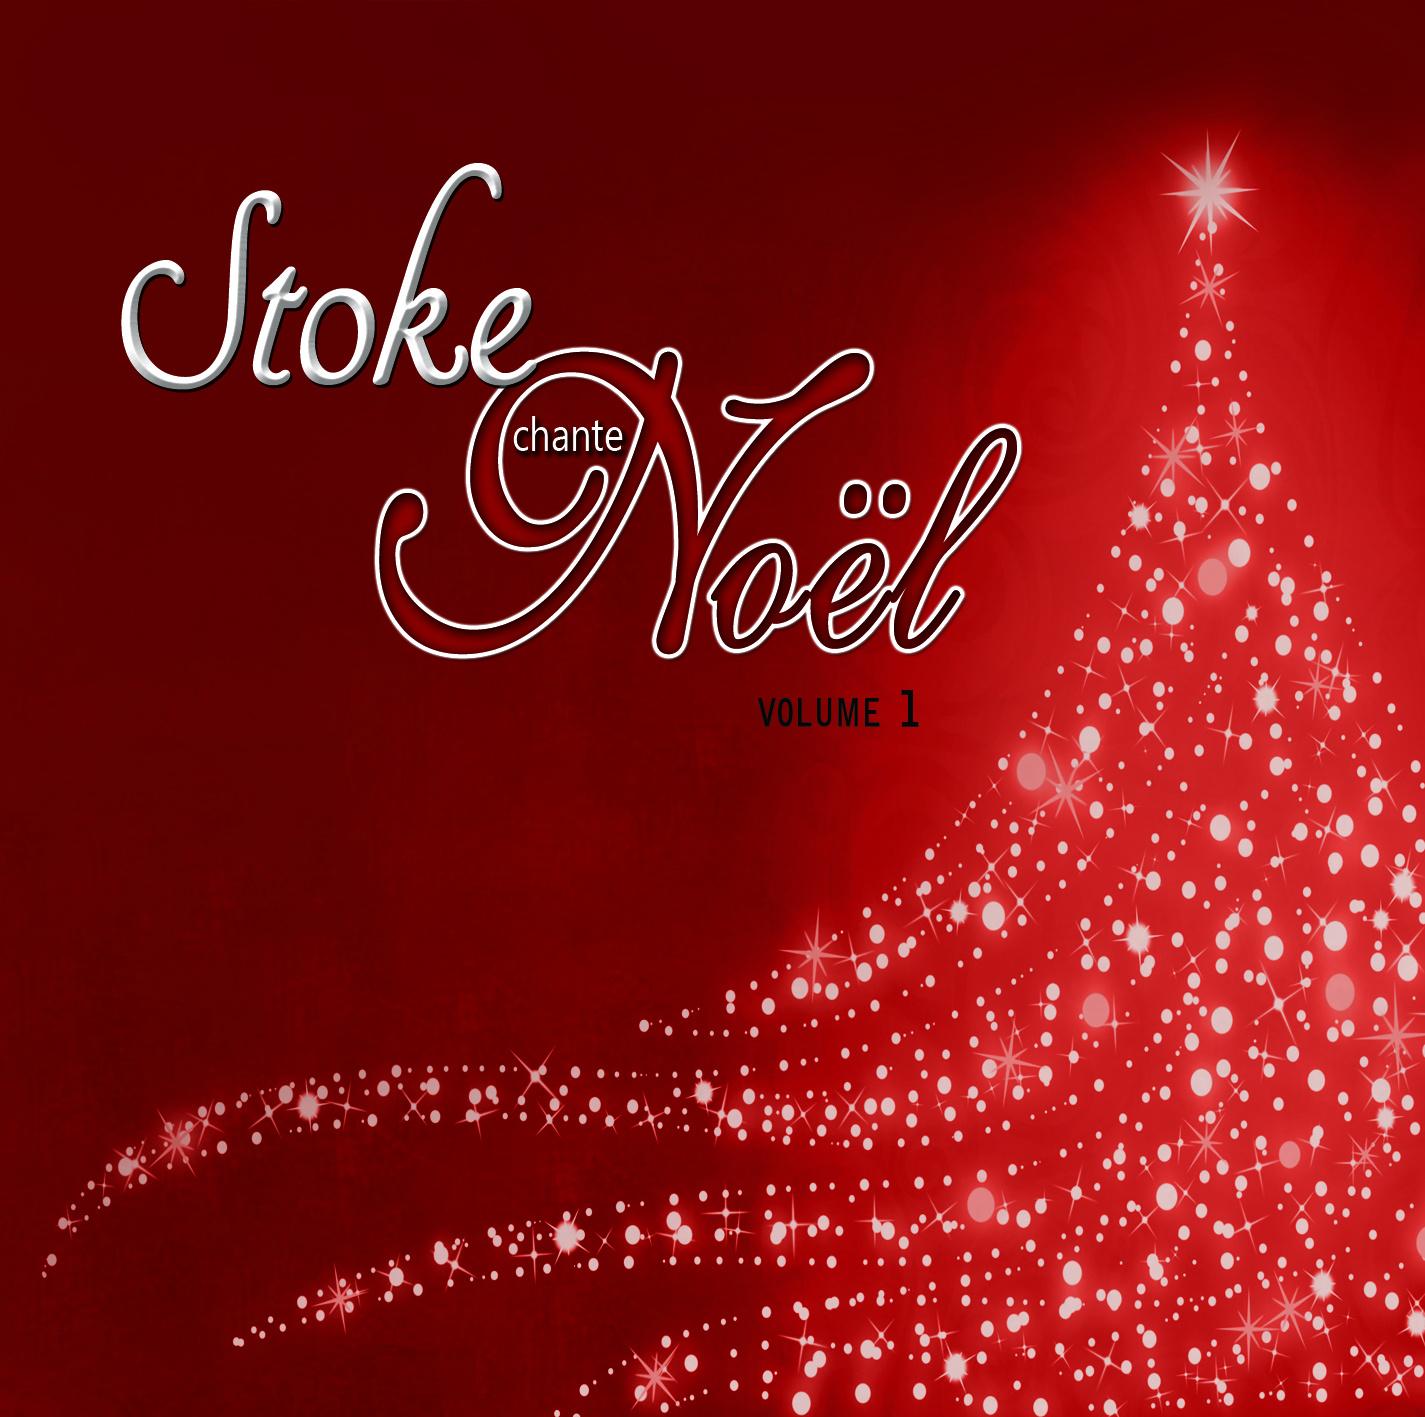 Stoke chante noel_volume 1